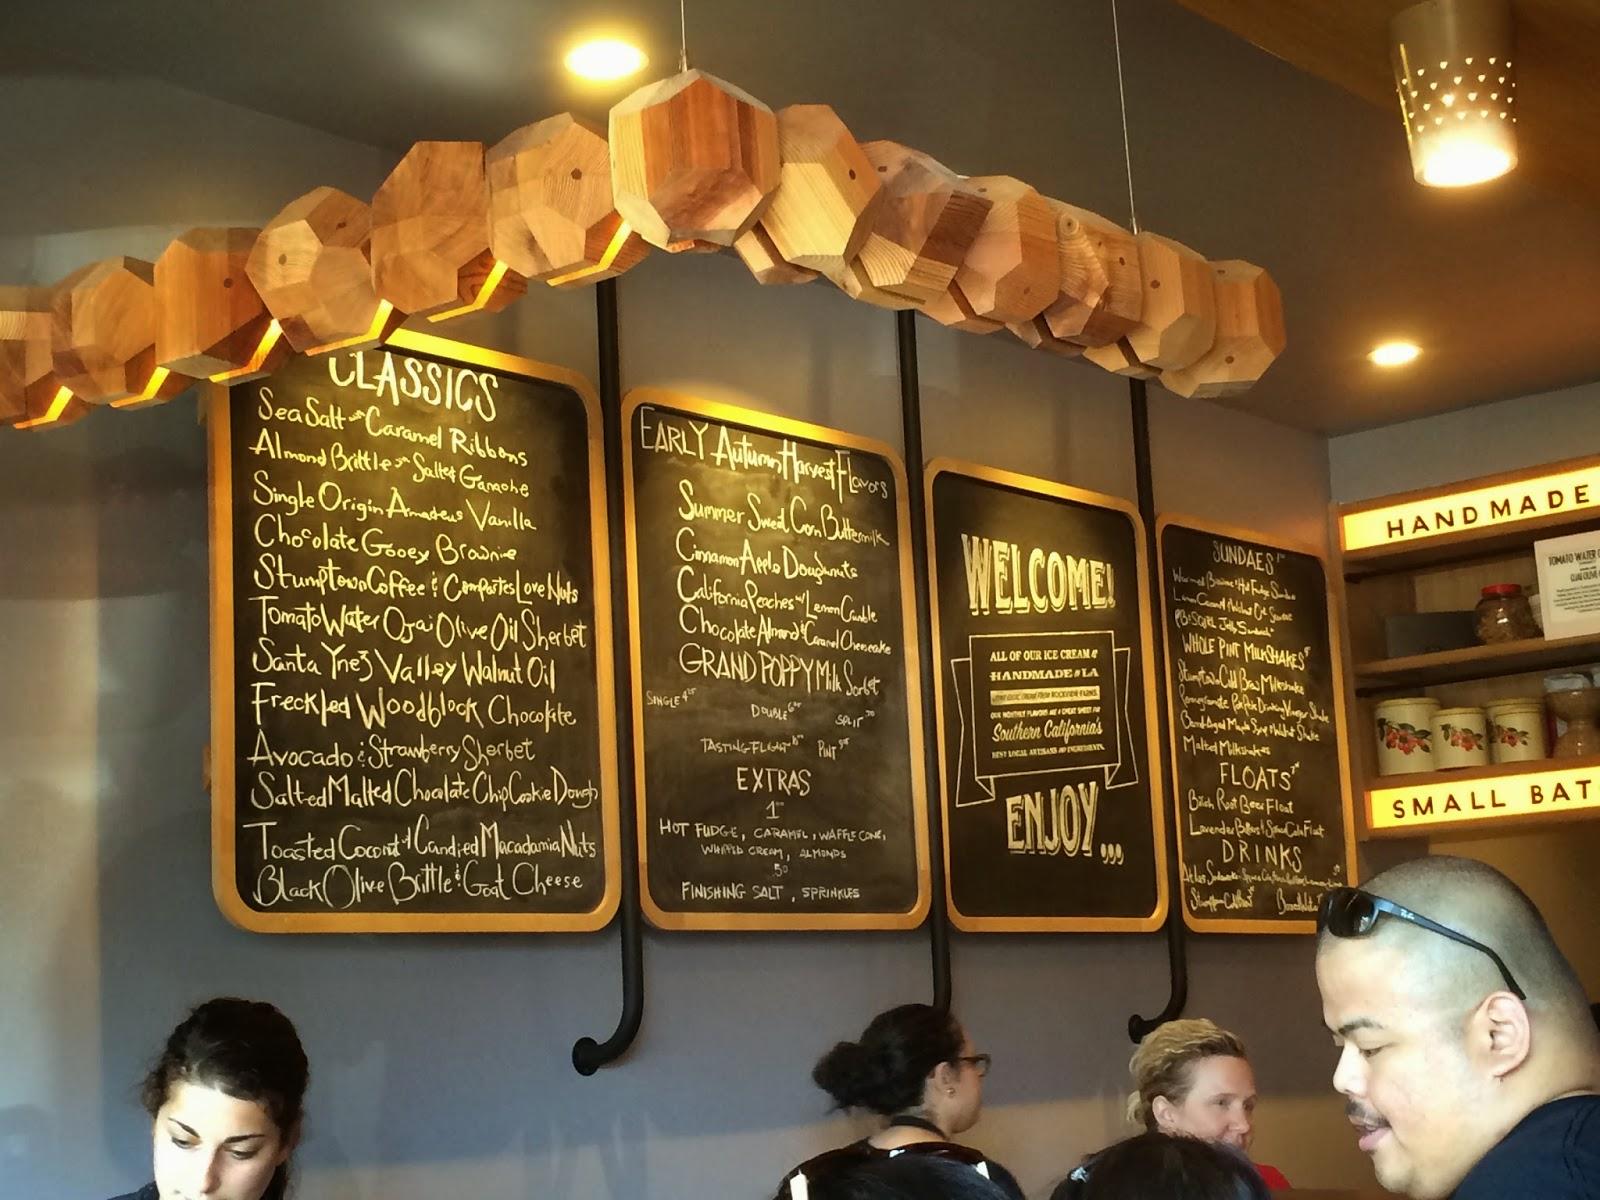 Italian Restaurants Larchmont New York